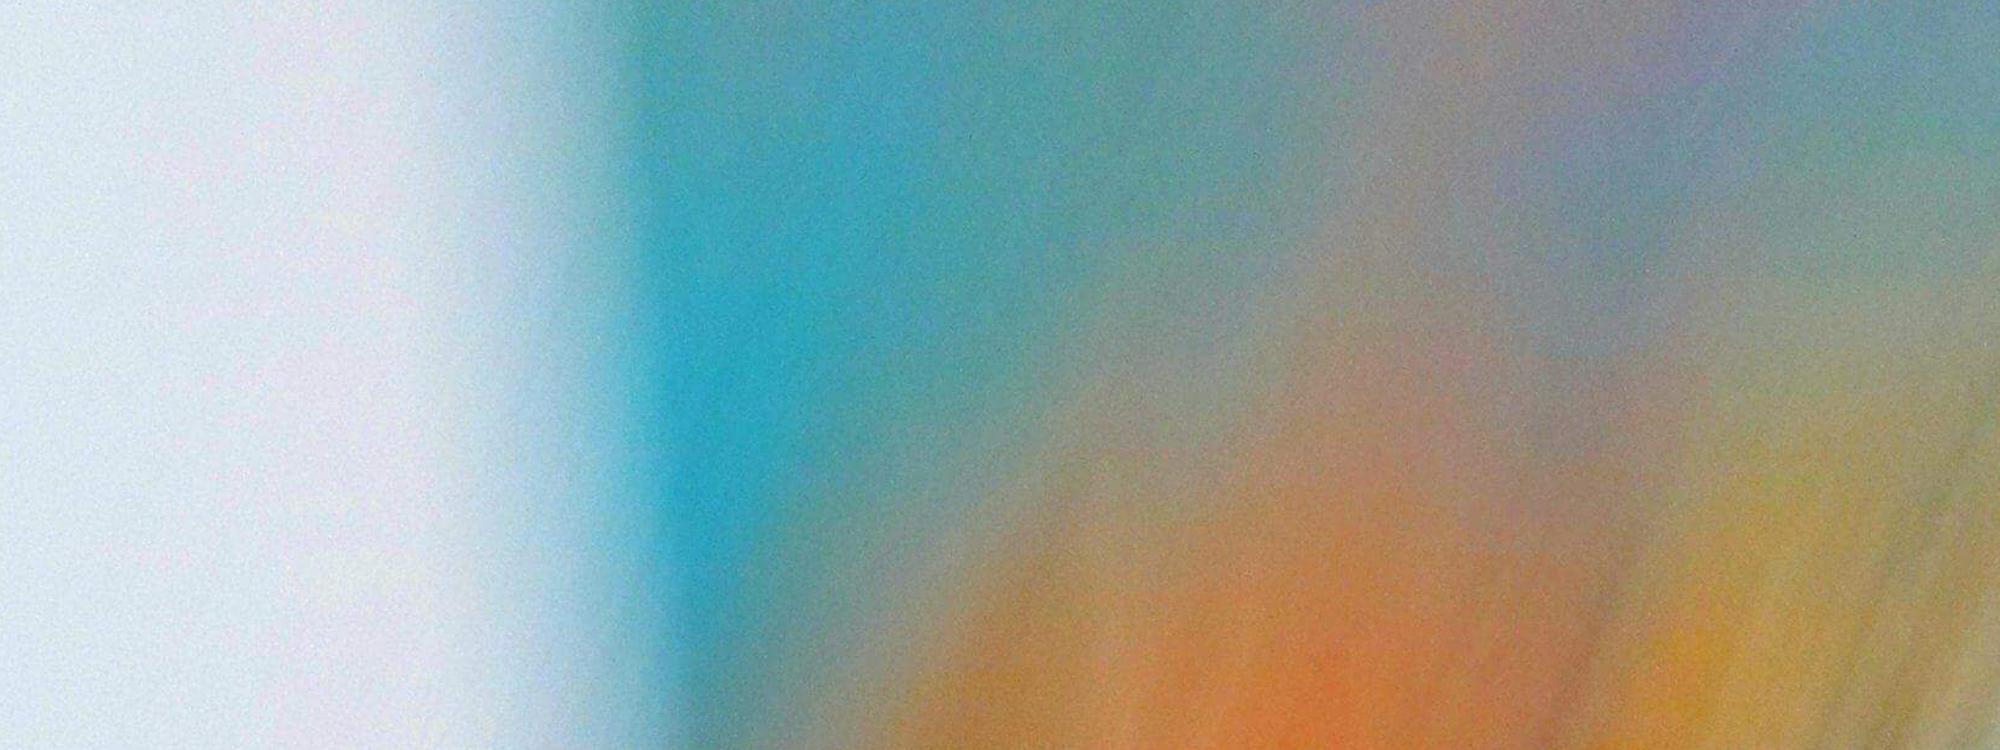 2018-06-07 - dobreathe - blog image multi colour. pxm.jpg